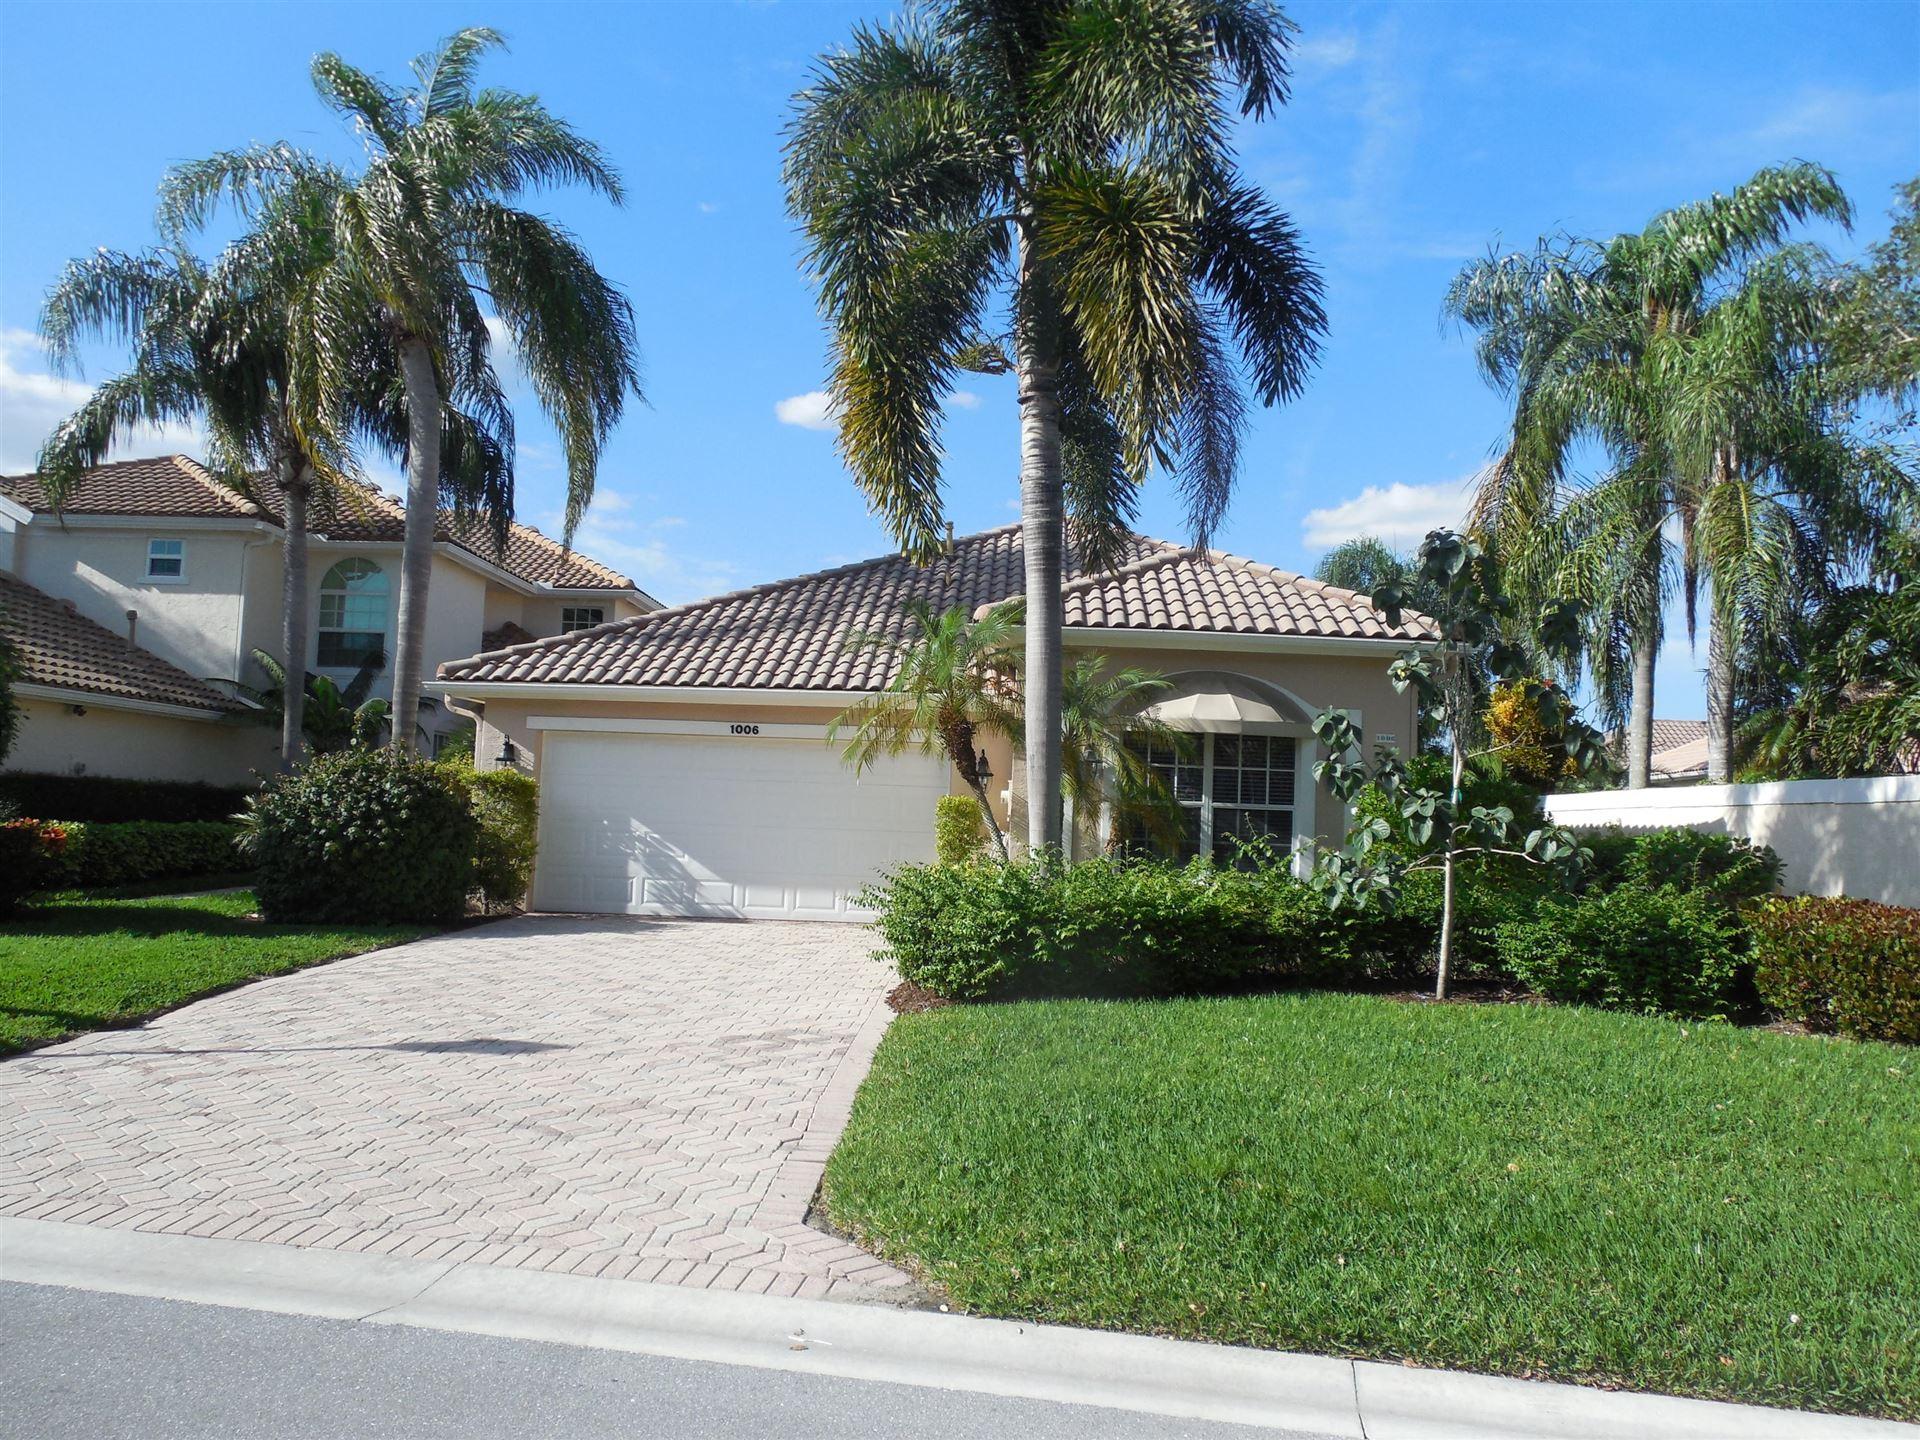 Photo of 1006 Diamond Head Way, Palm Beach Gardens, FL 33418 (MLS # RX-10648907)